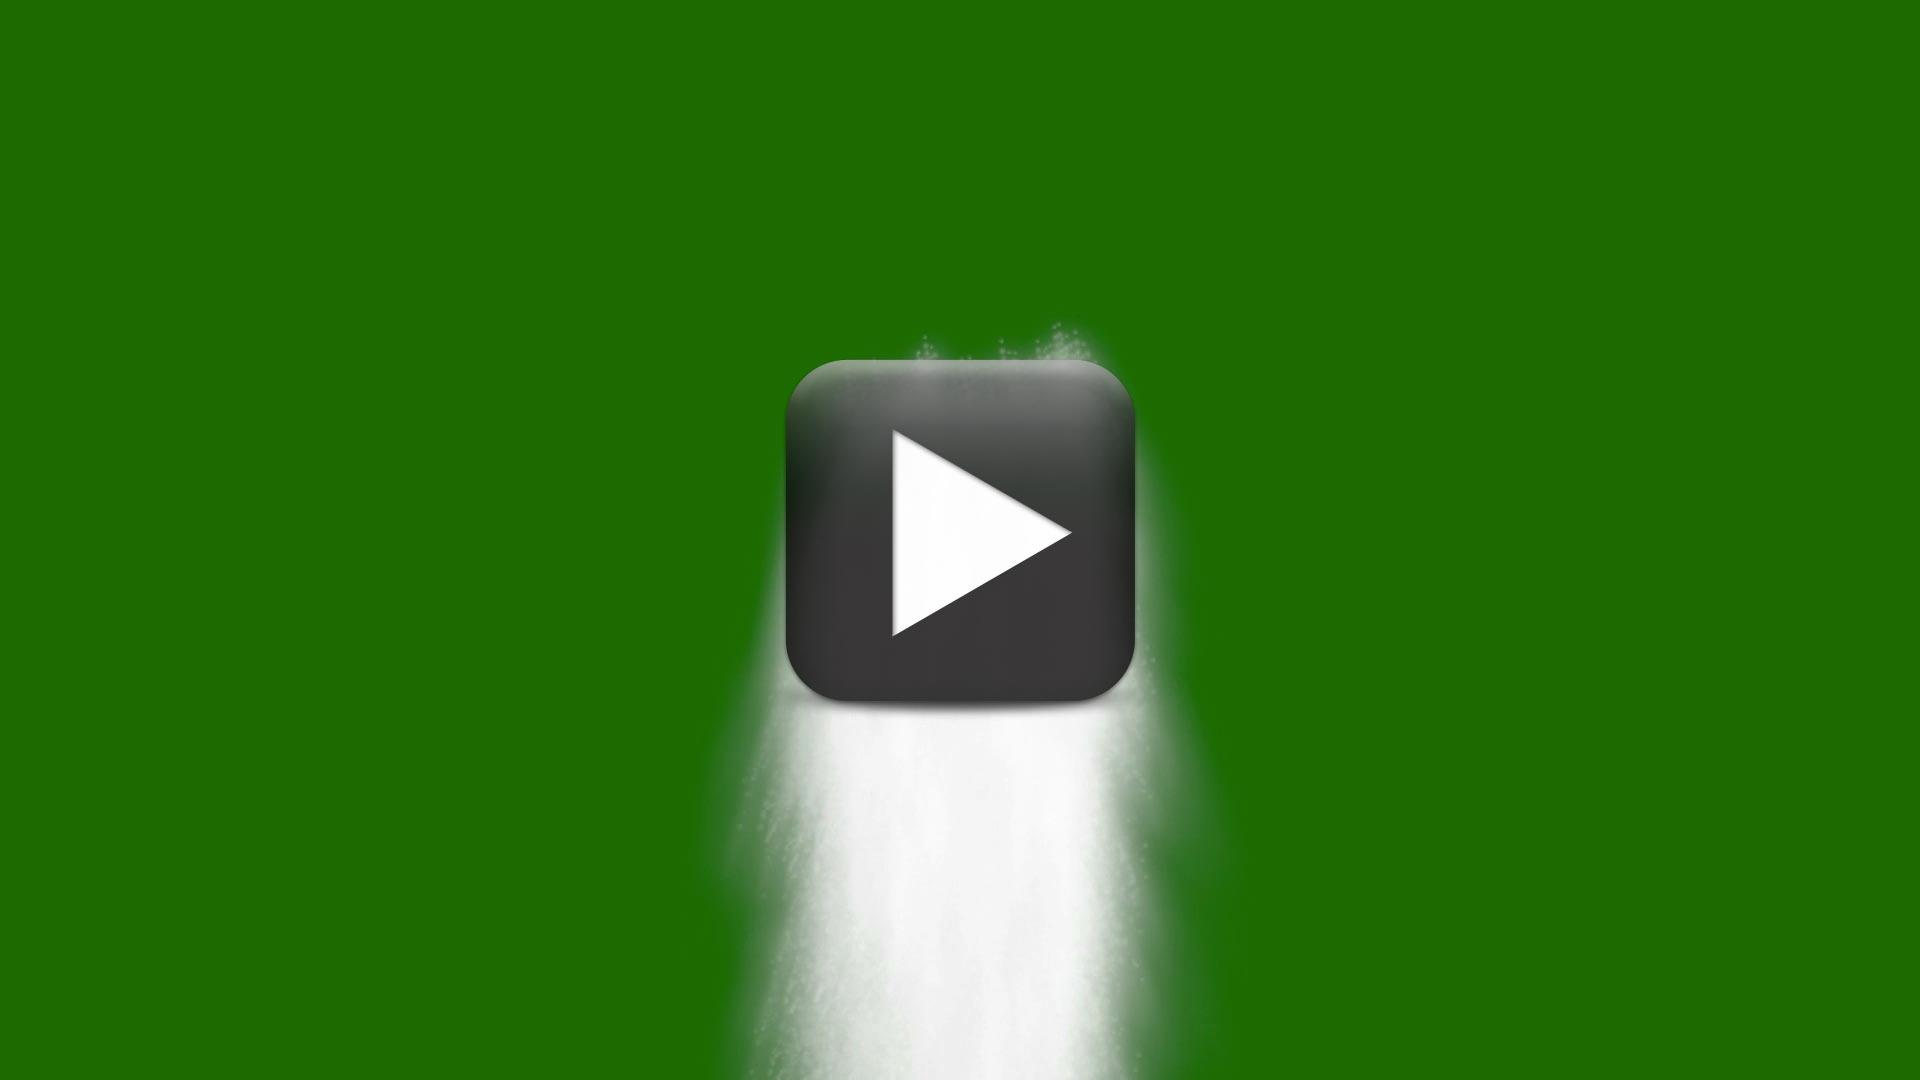 Free Waterfall Green Screen Effects